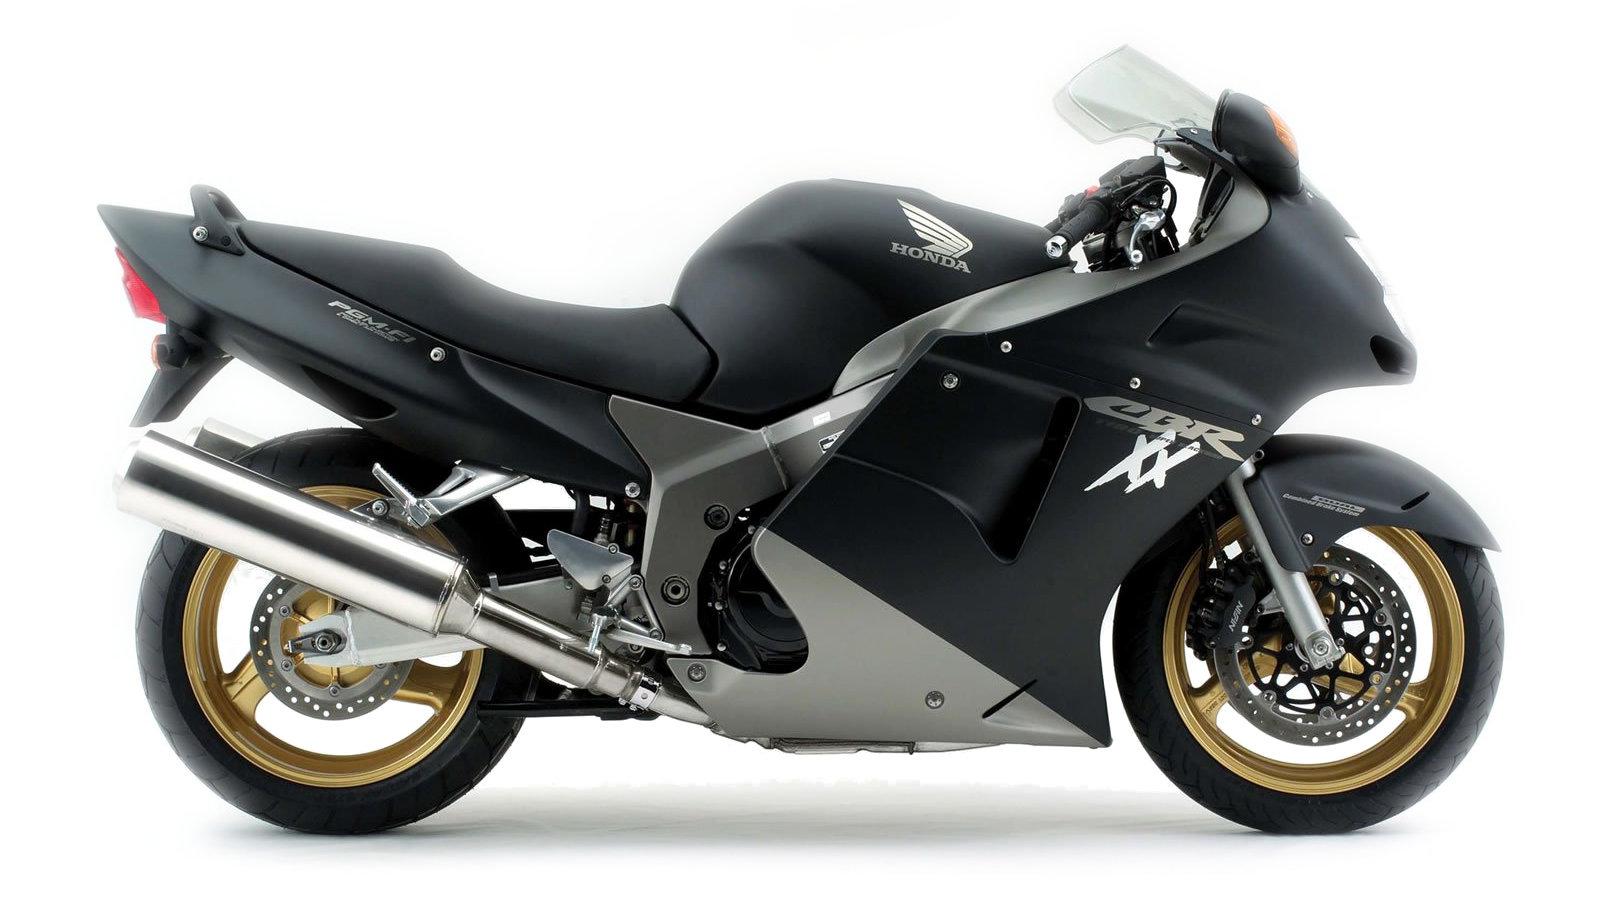 Moto del día: Honda CBR 1100 XX Super Blackbird